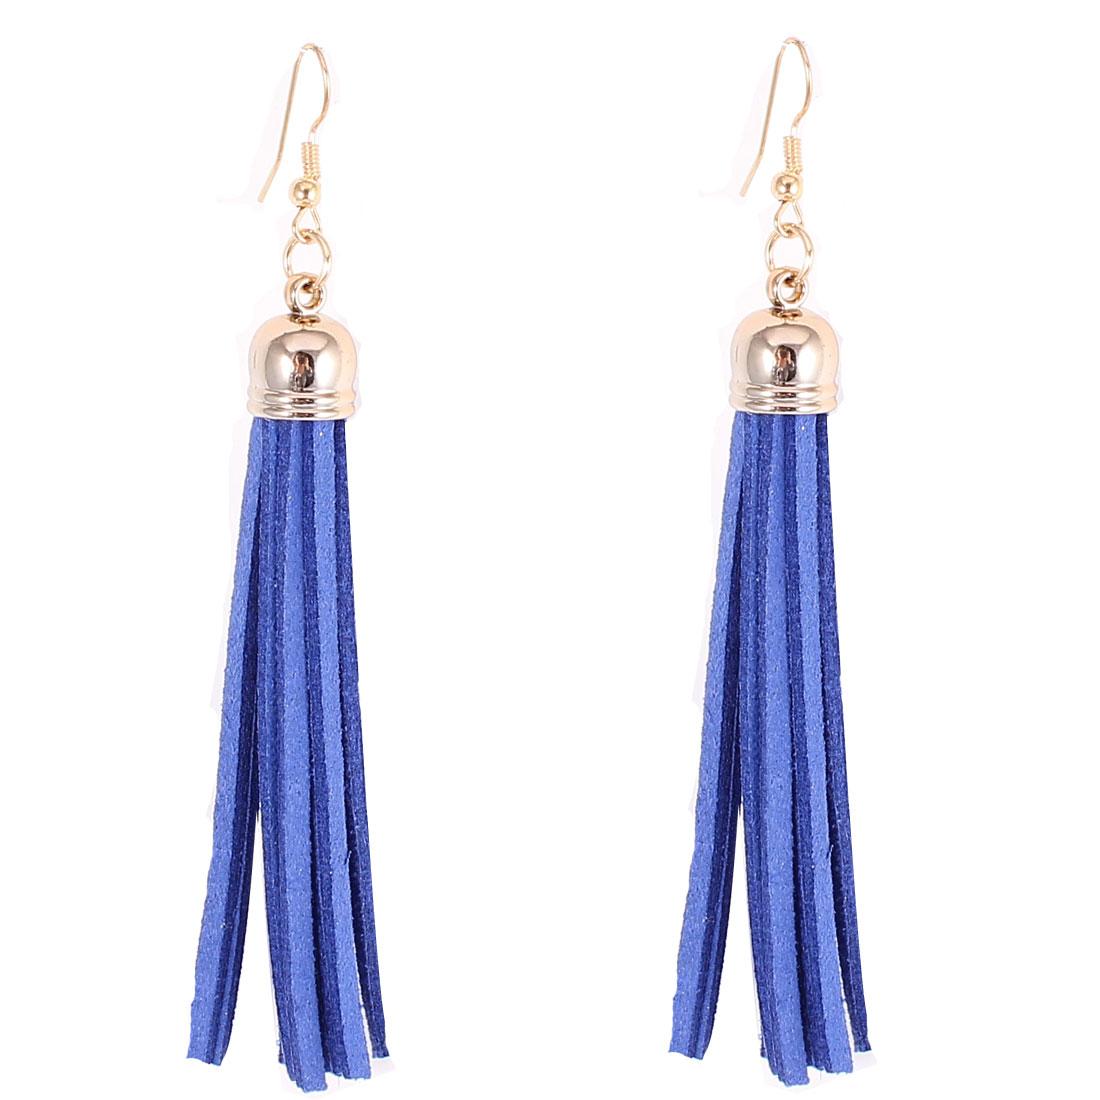 Woman Decoration Felt Tassel Pendant Fish Hook Dangling Eardrop Earrings Blue Pair